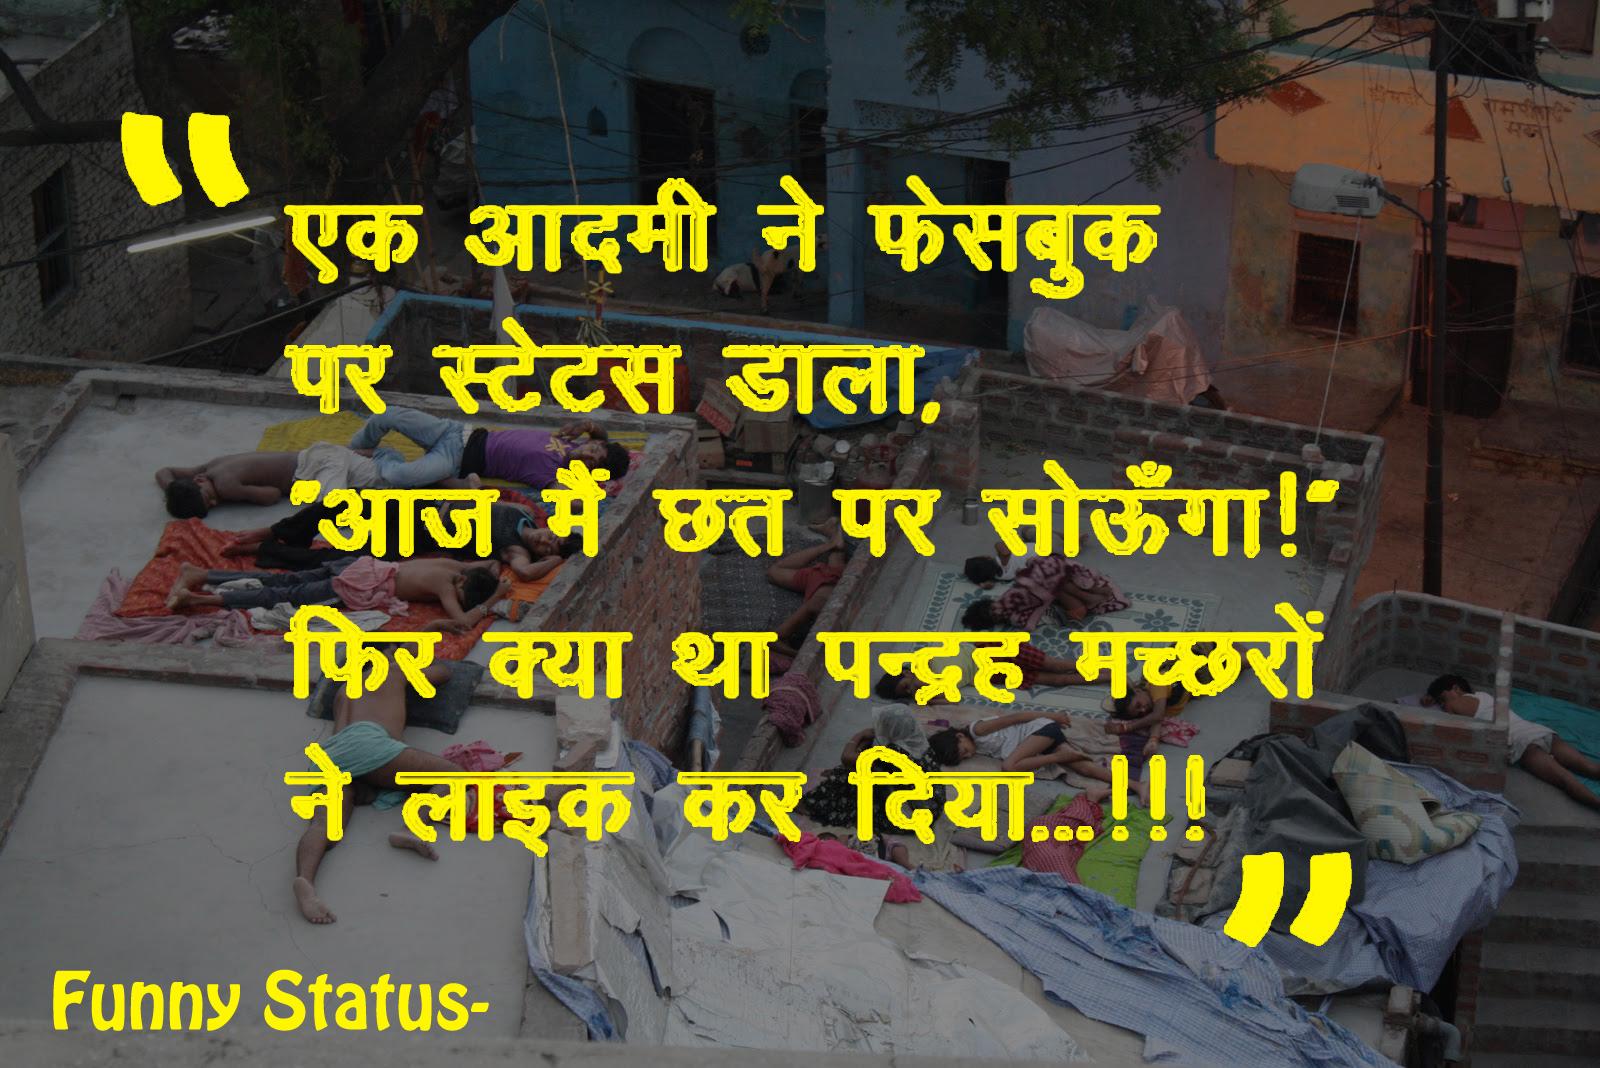 Facebook Status in Hindi 2019- WhatsApp Status, Instagram Status